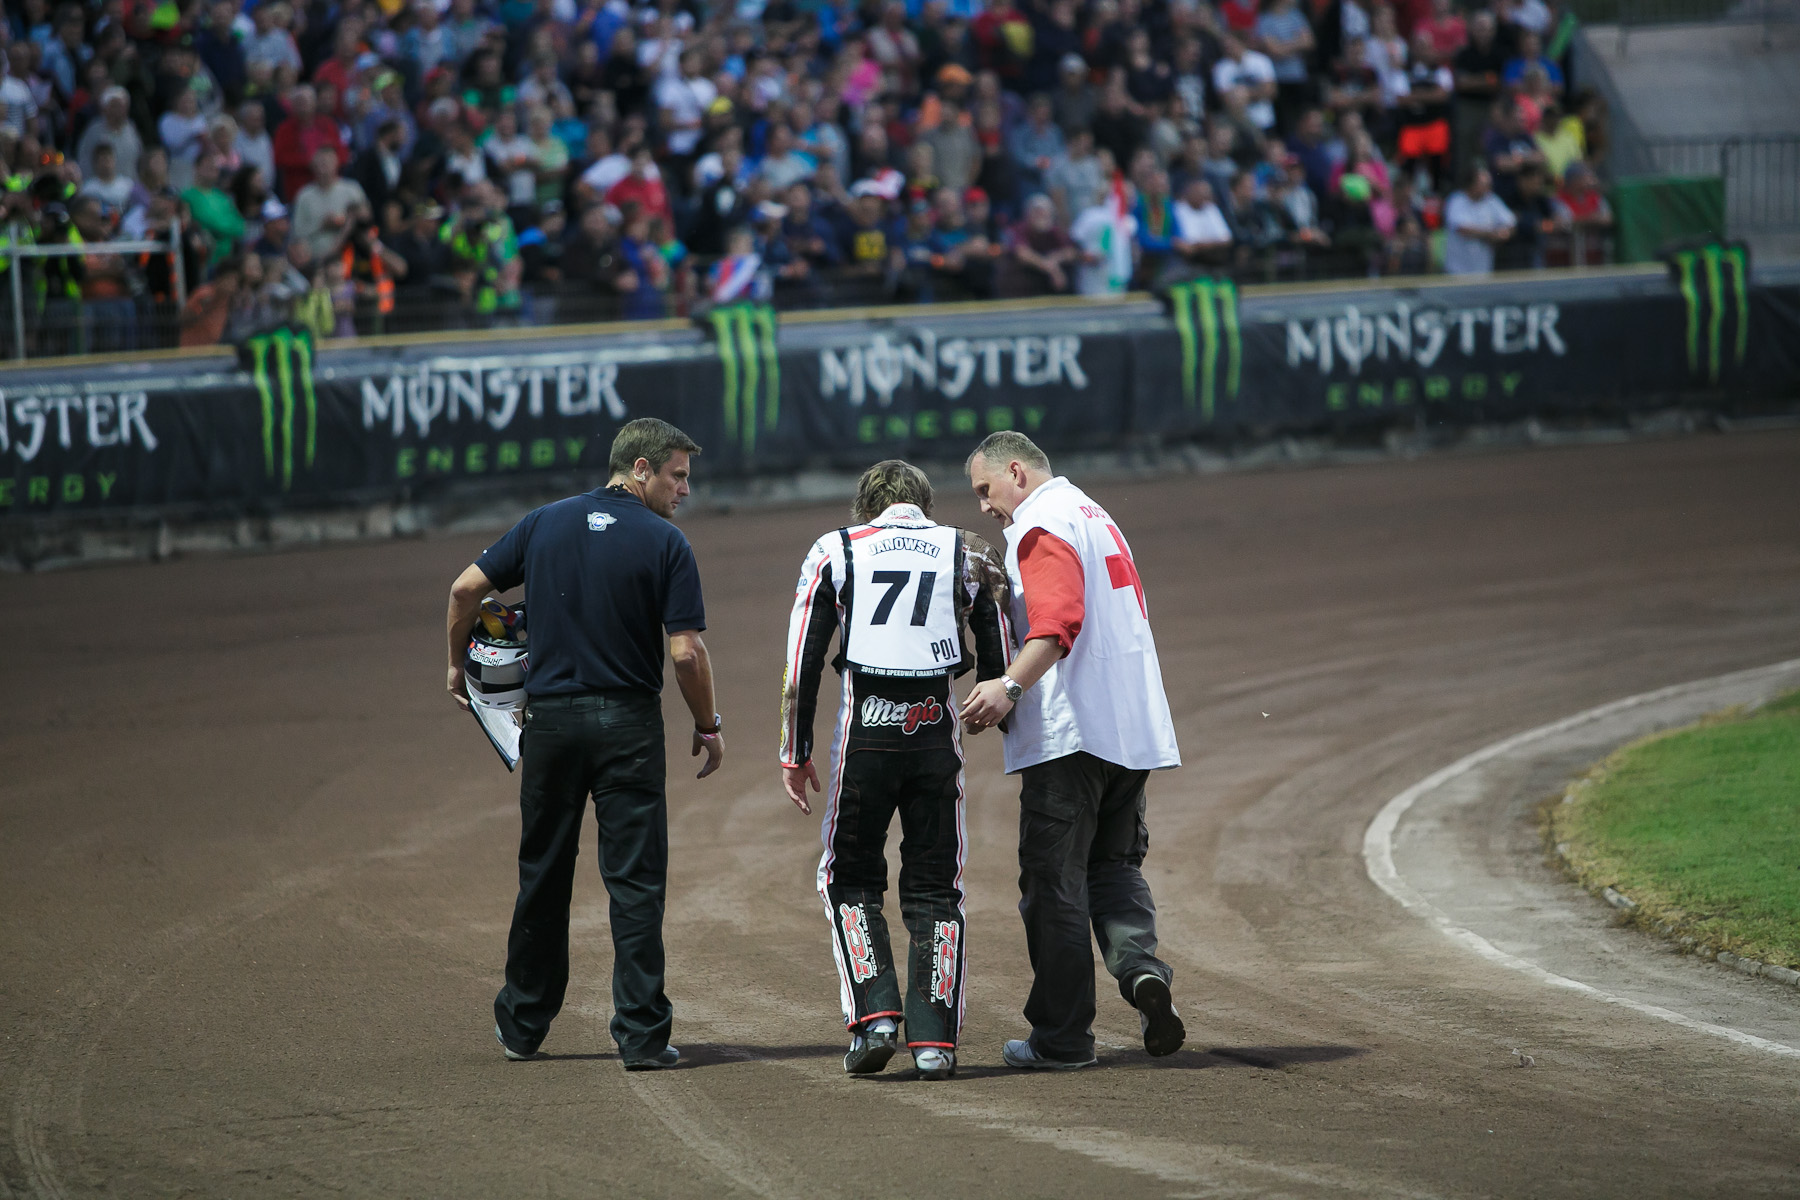 Maciej Janowski of Poland walks away from a crash with no serious injuries during the Mitas Slovenian FIM Speedway Grand Prix at Matija Gubec Stadium in Krsko, Slovenia, Sep. 12, 2015.